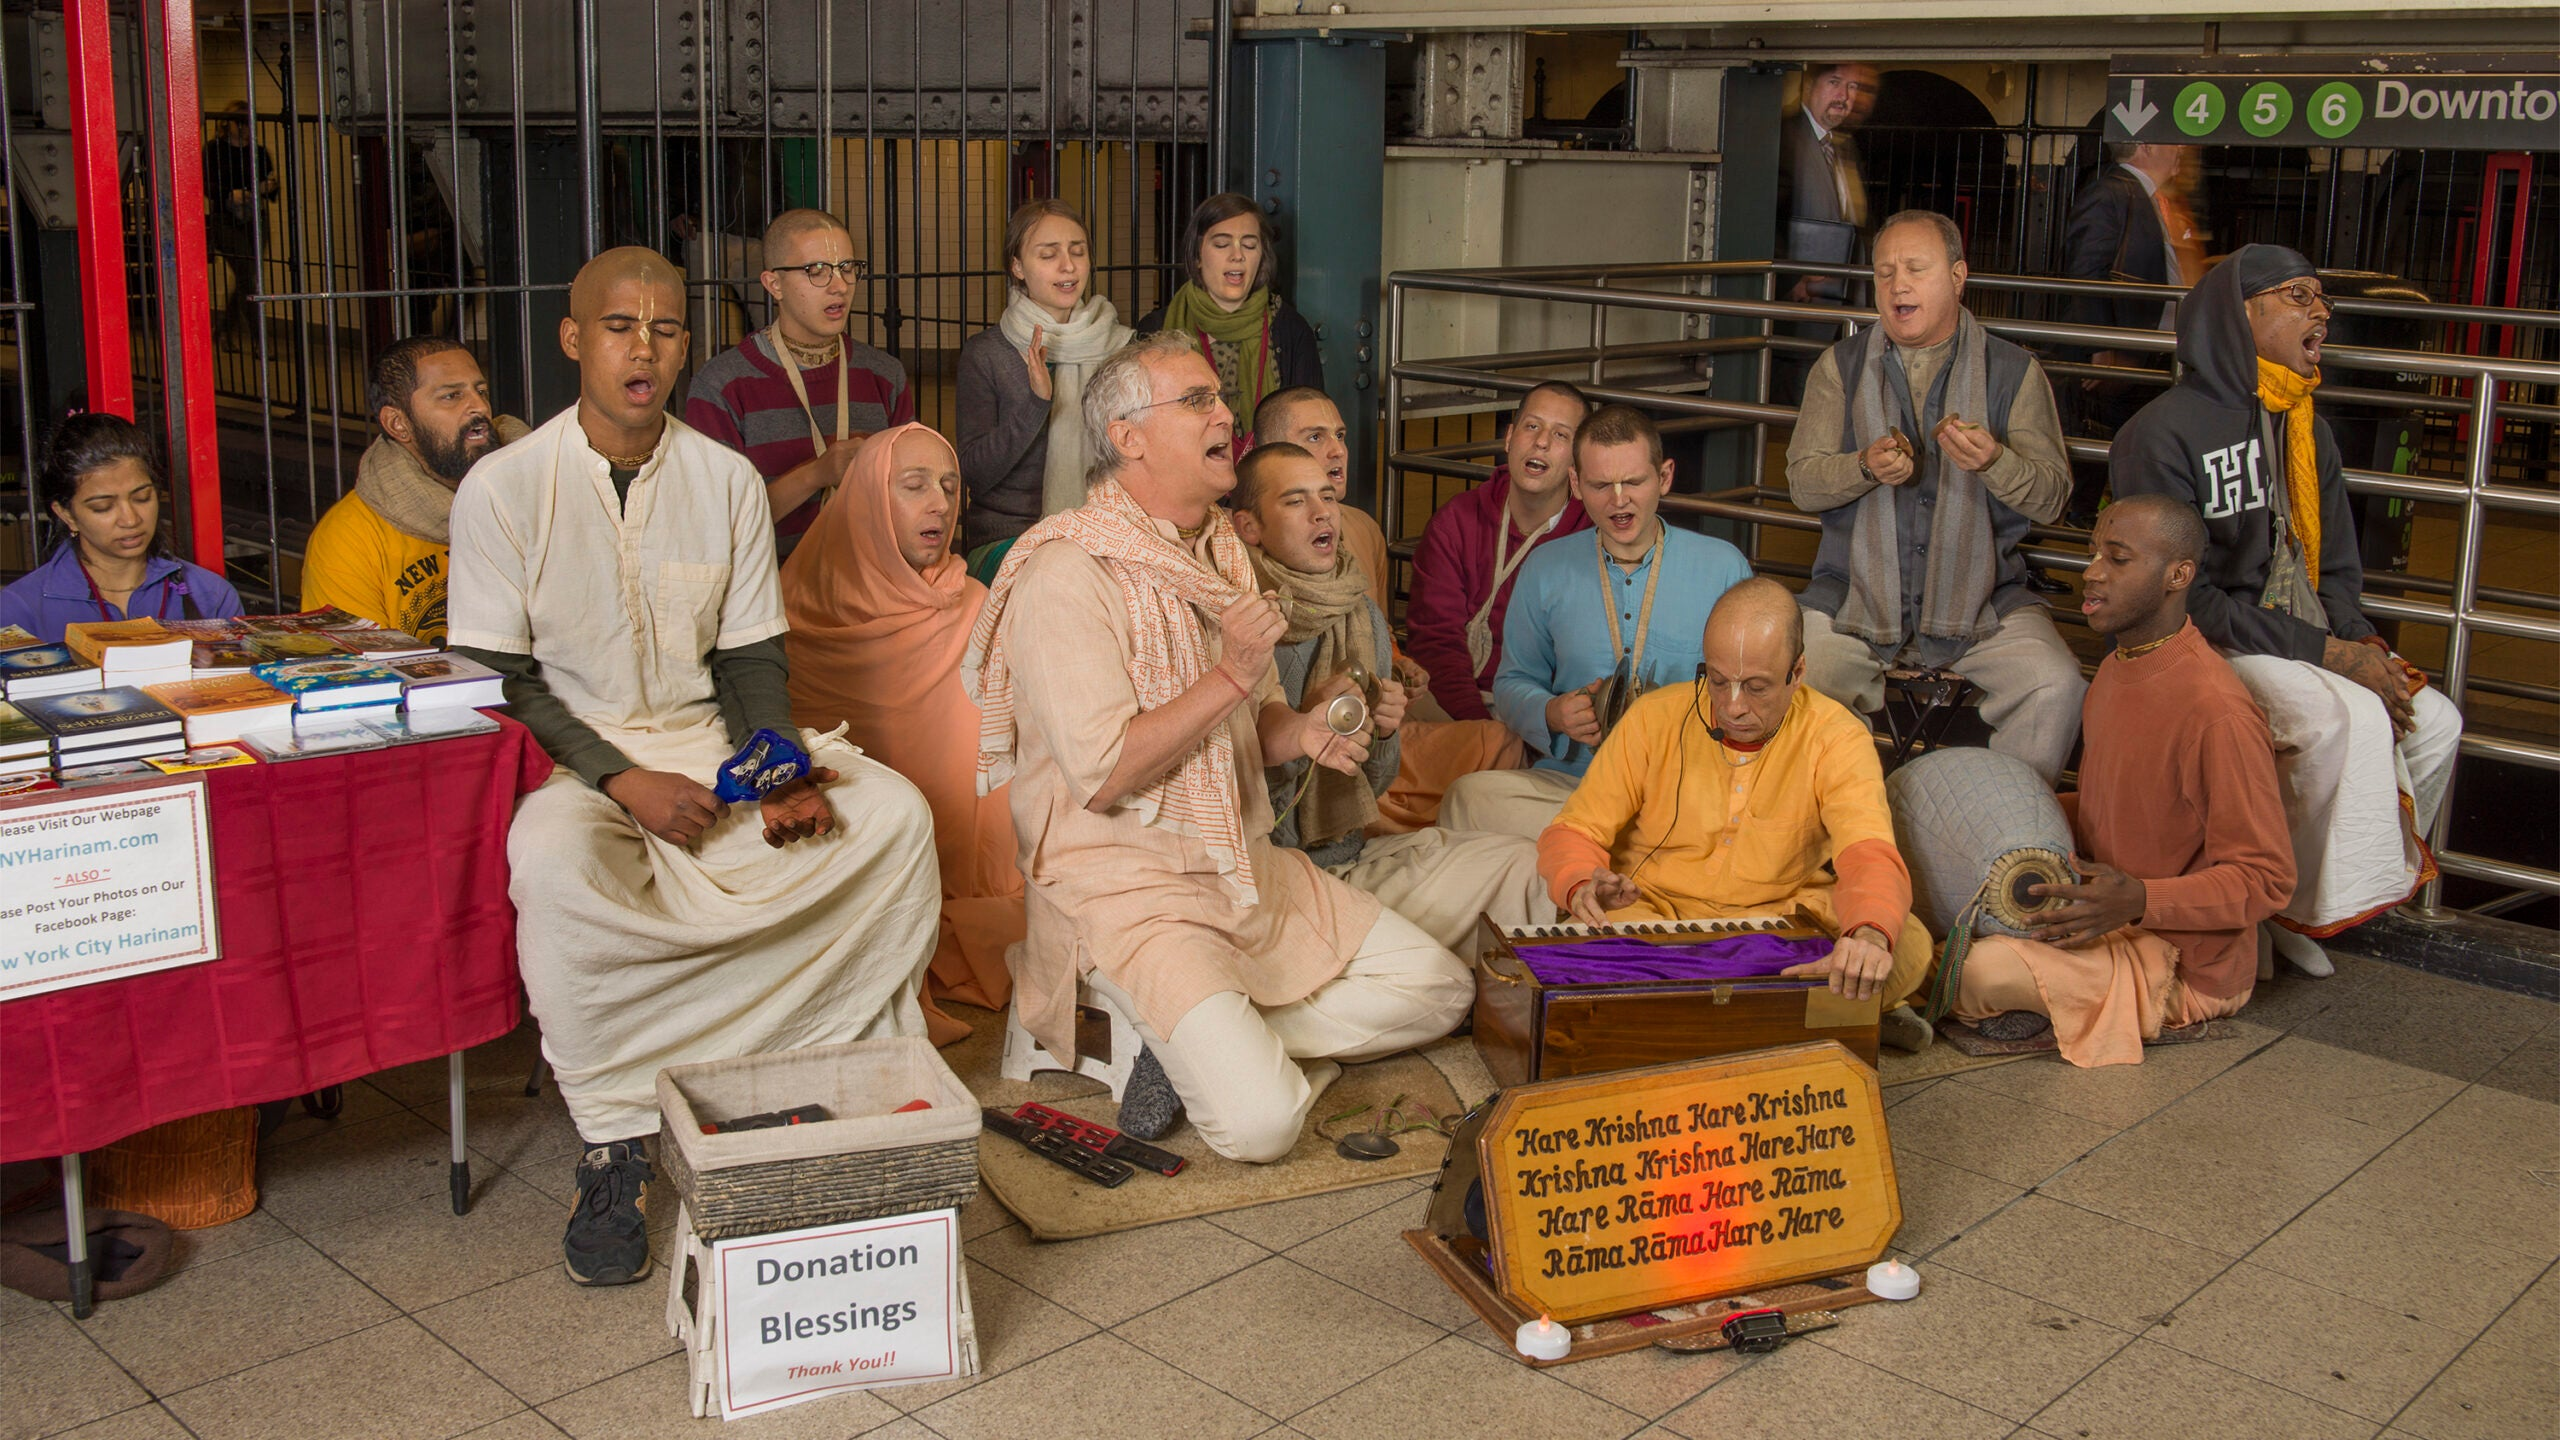 Group Portrait Photographer Neal Slavin's Prayer Project